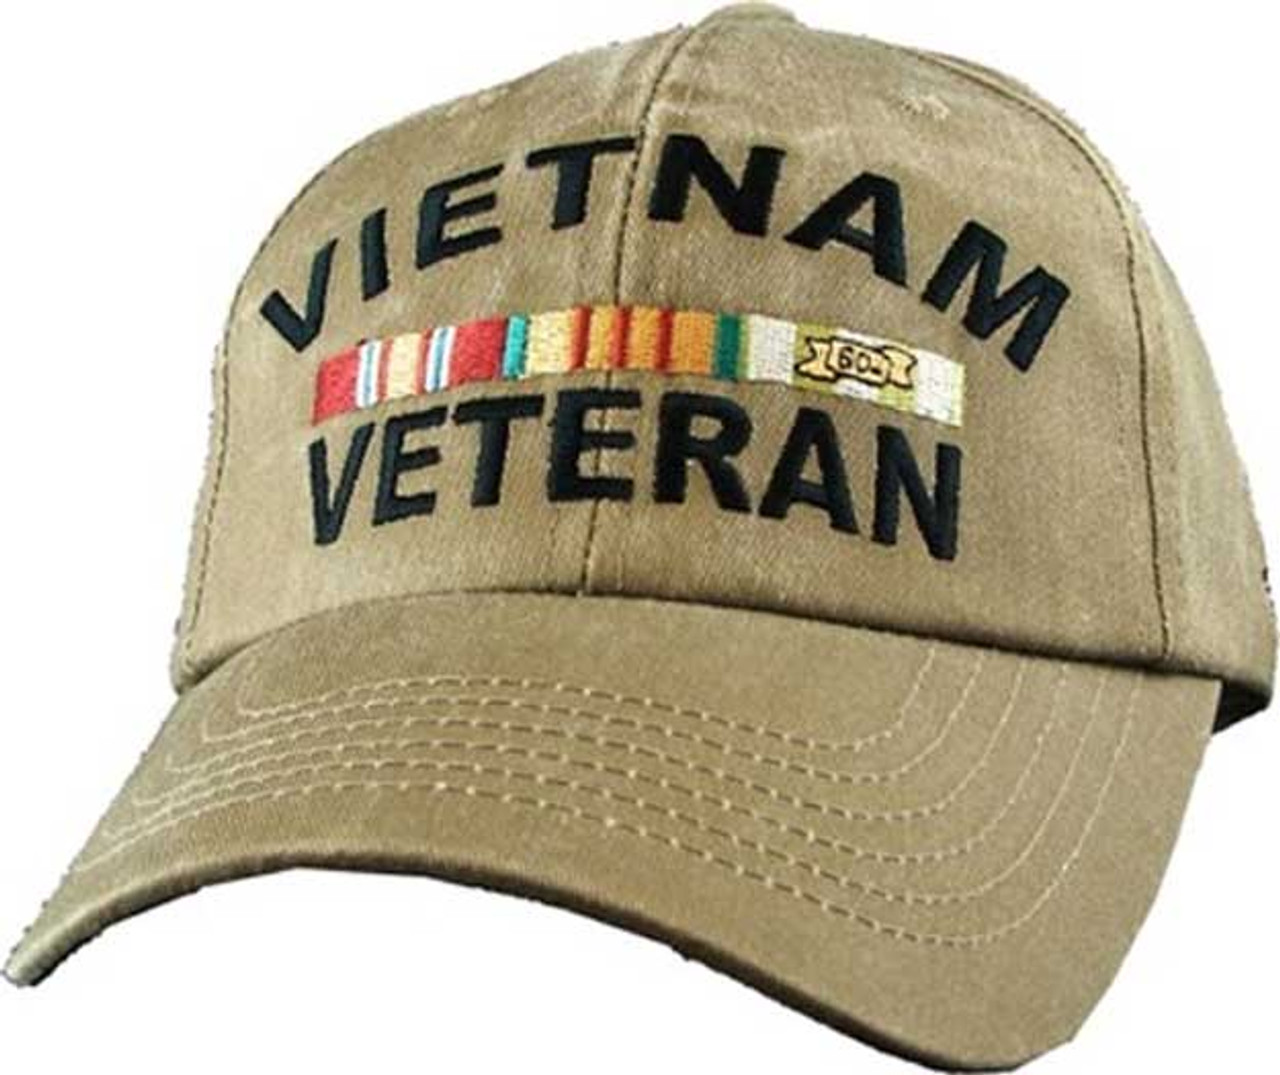 Vietnam Veteran With Ribbons Khaki Military Hat Baseball Cap 0c251ac285b